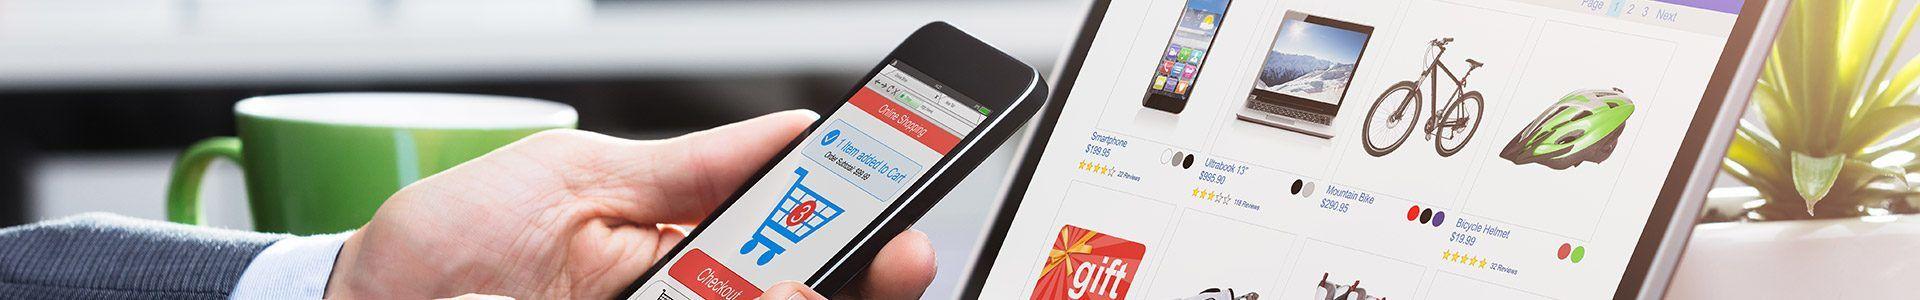 concepten online shopping